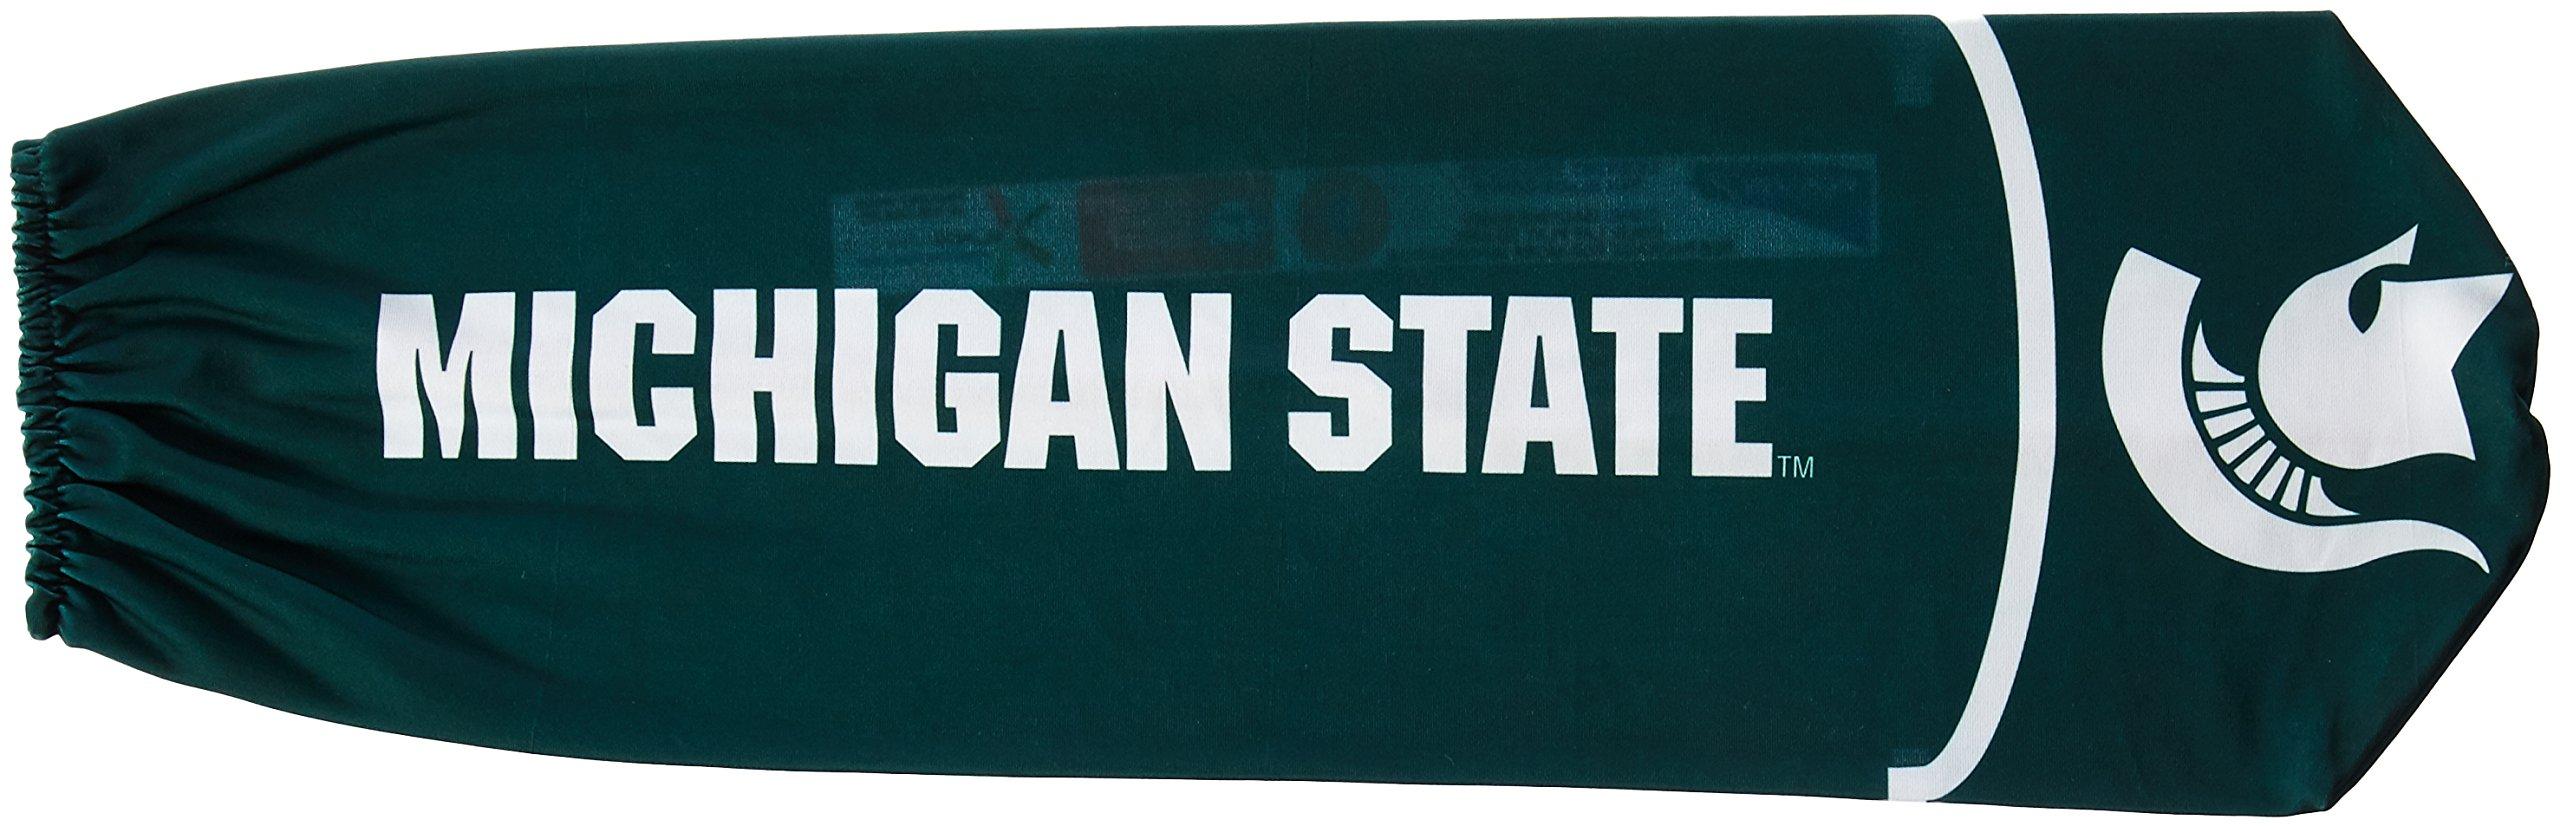 Fan Blade Designs Michigan State Ceiling Fan Blade Covers